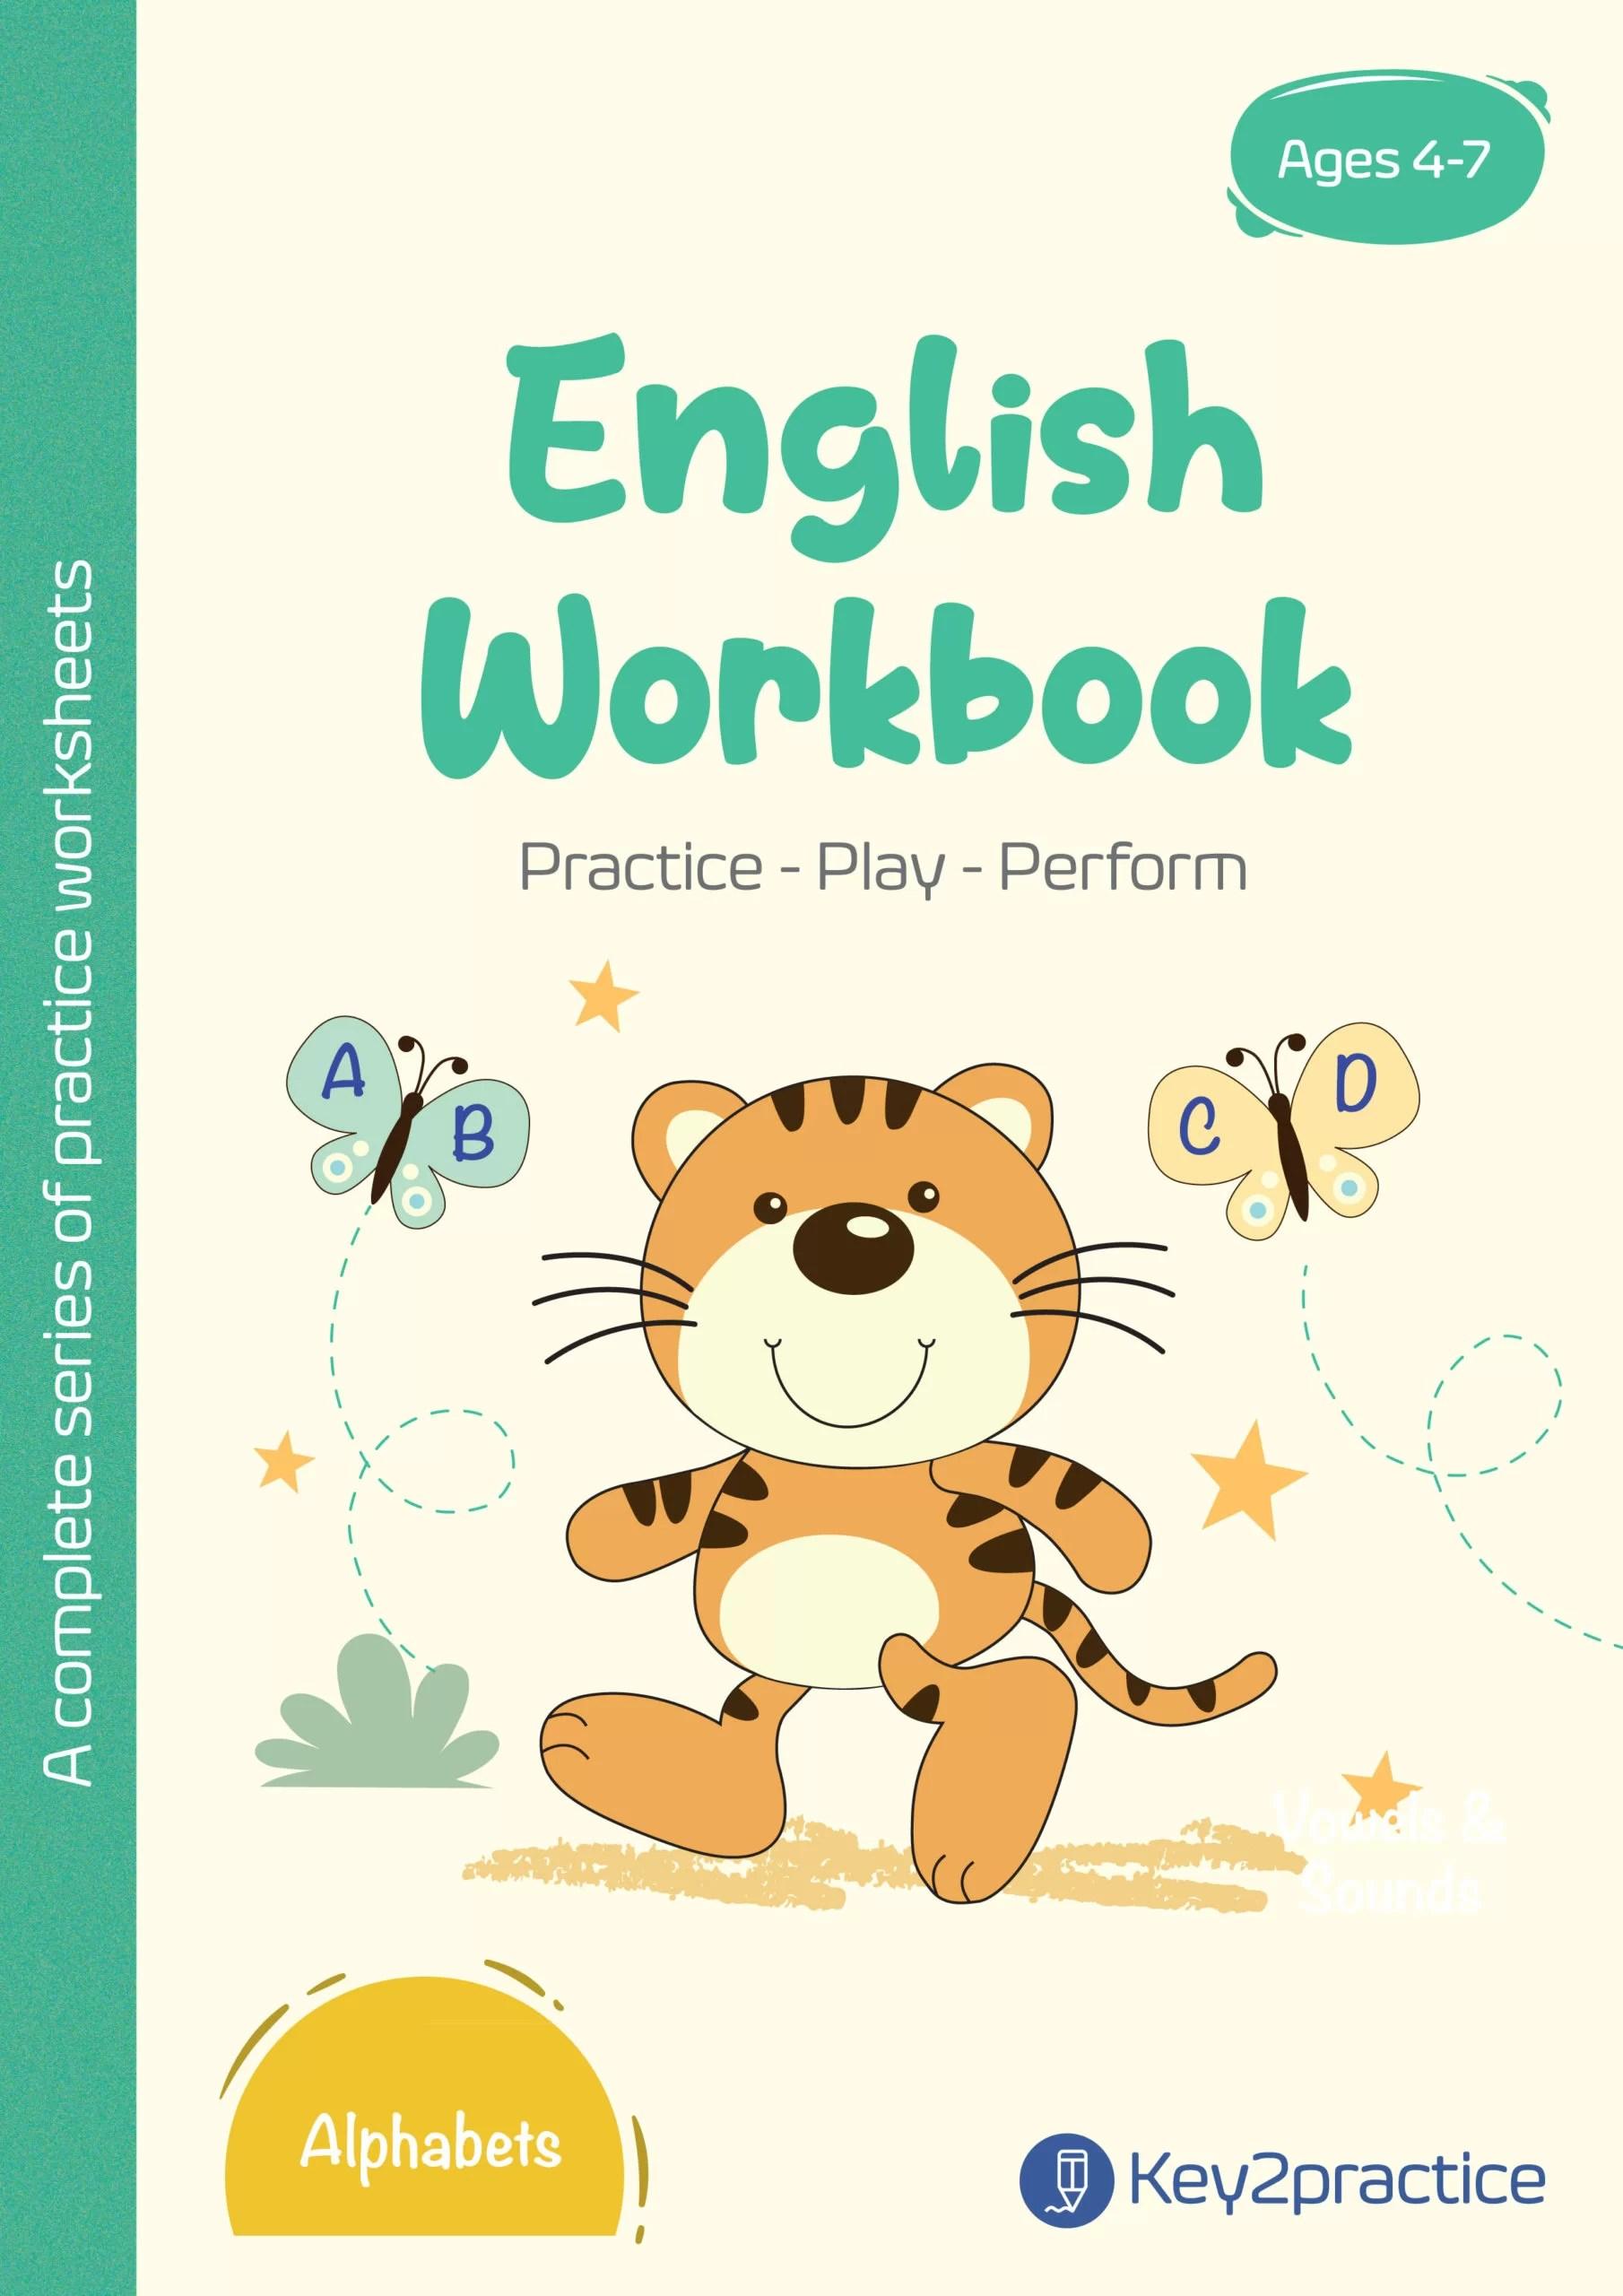 Worksheets on Alphabets Pre-primary - key2practice Workbooks [ 2560 x 1810 Pixel ]